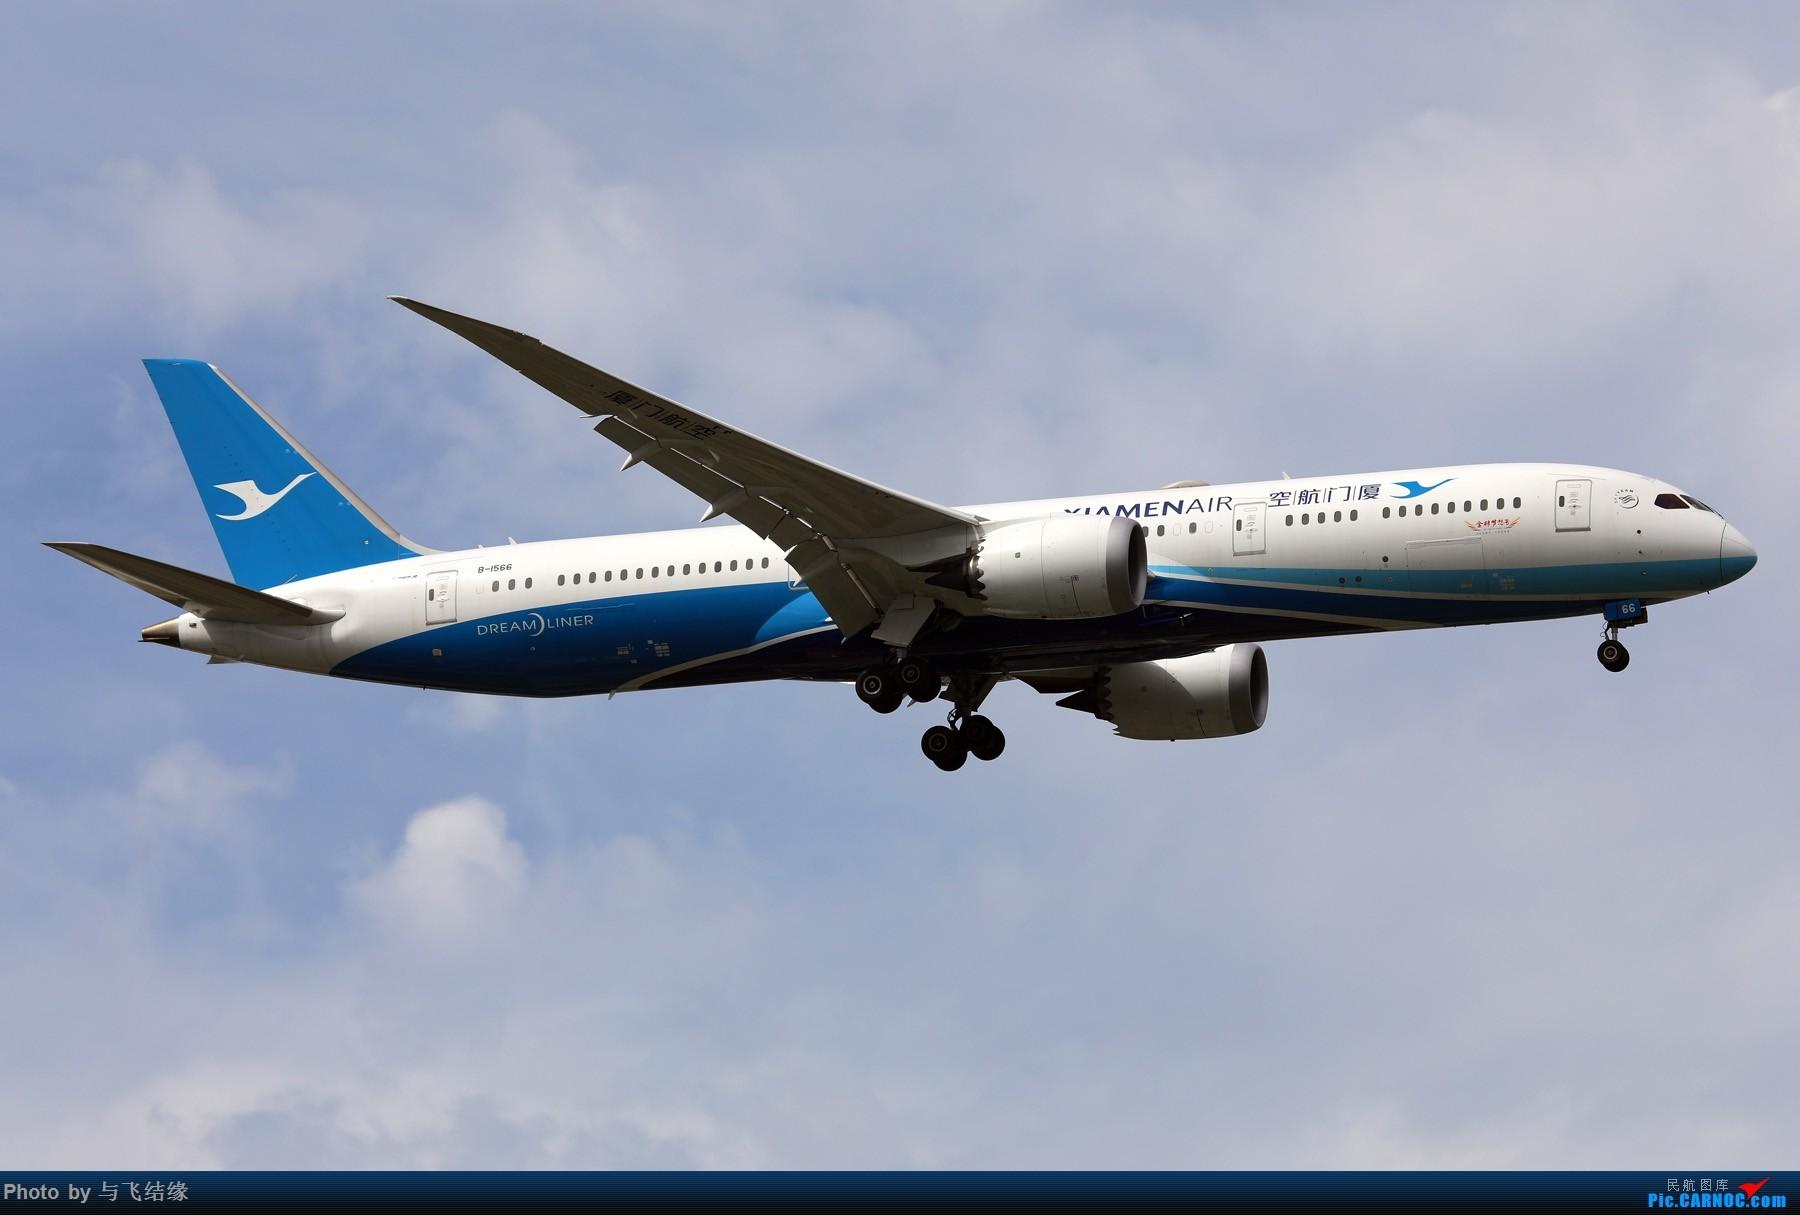 Re:[原创]今日立秋!随便发几张图。 BOEING 787-9 B-1566 中国北京首都国际机场